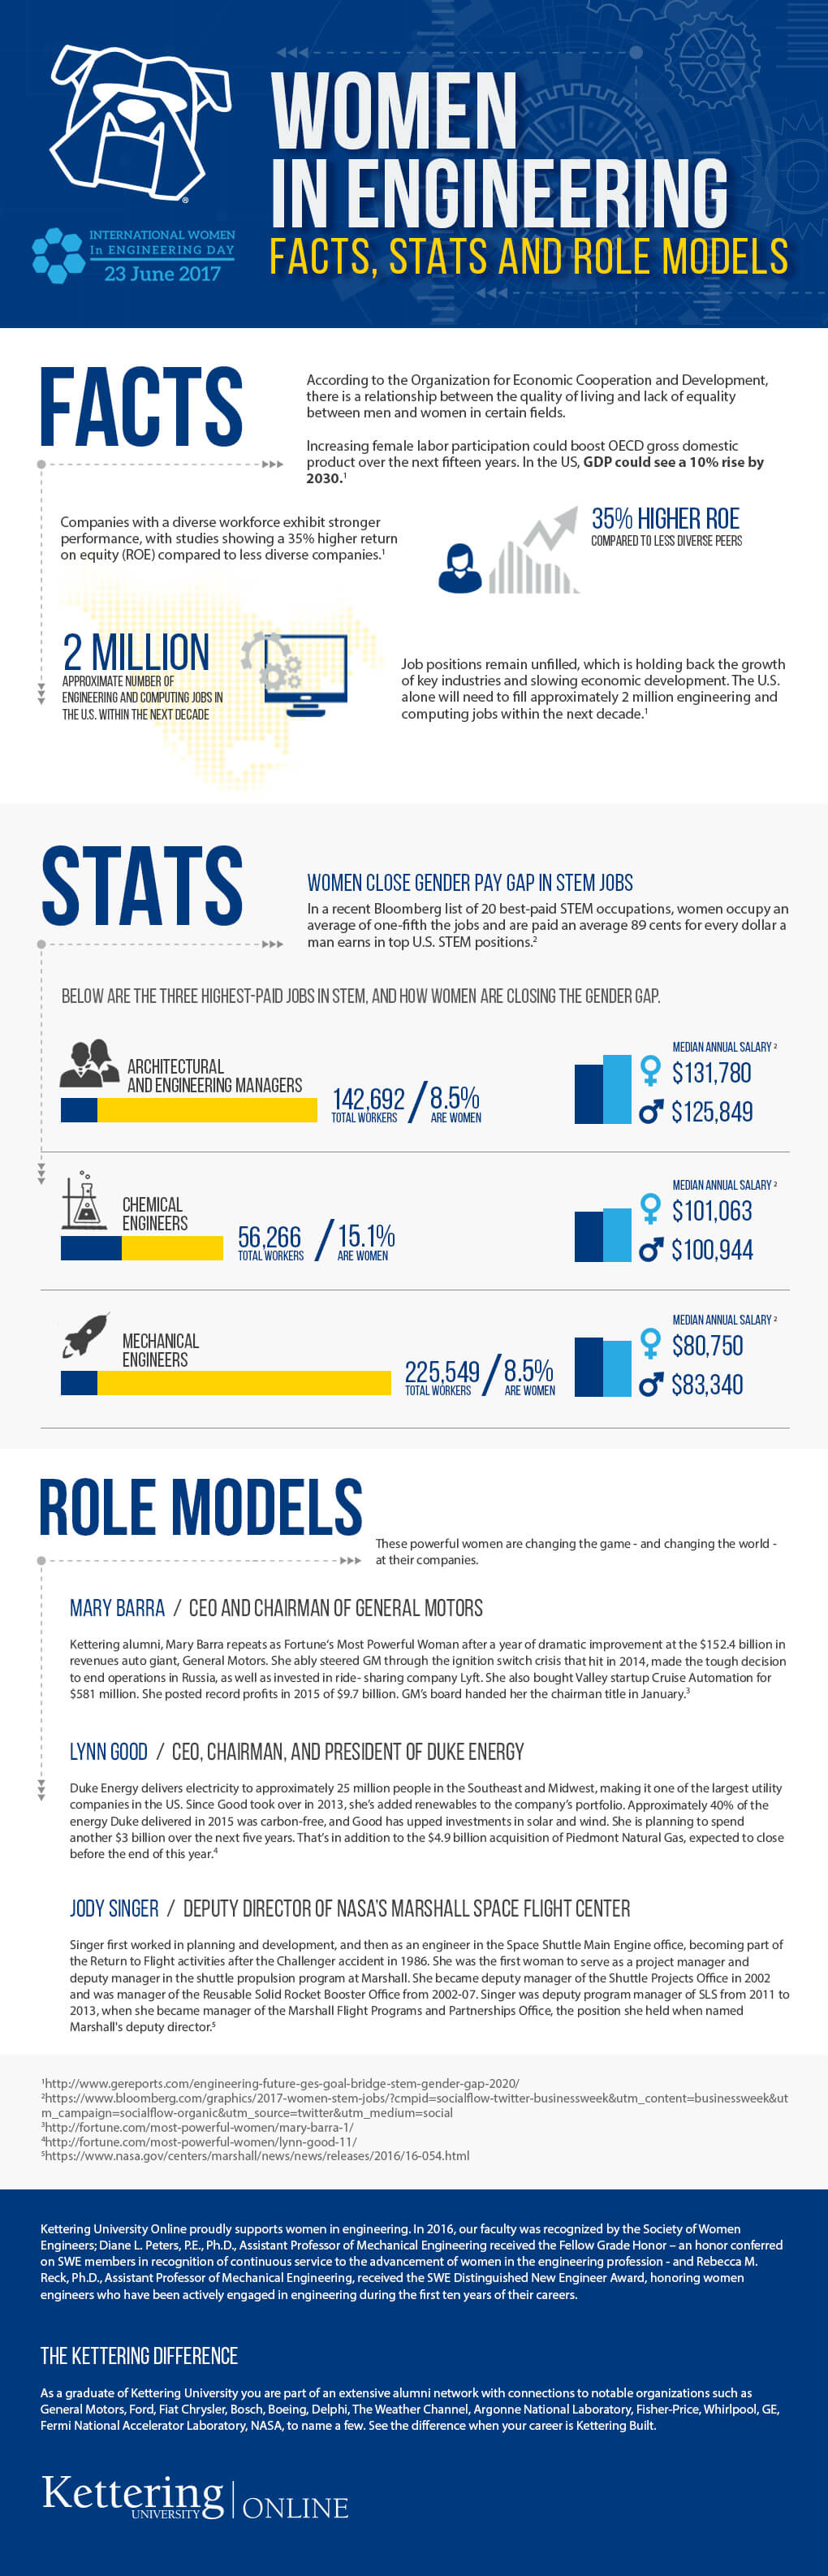 International Women in Engineering Day 2017 Infographic